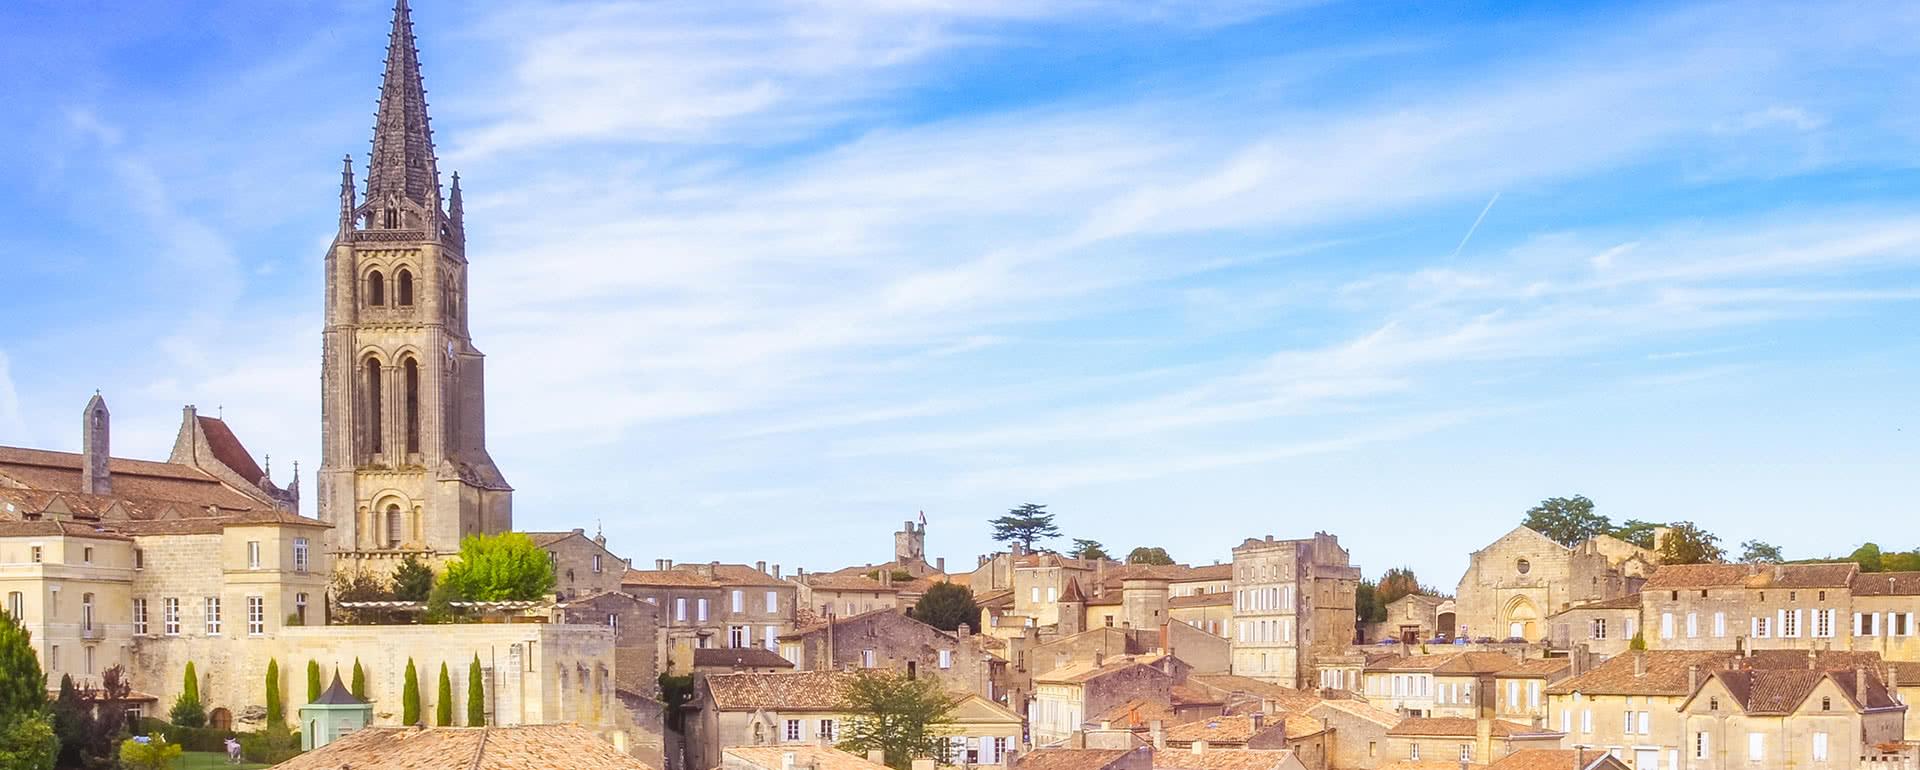 Titelbild von Bordeaux